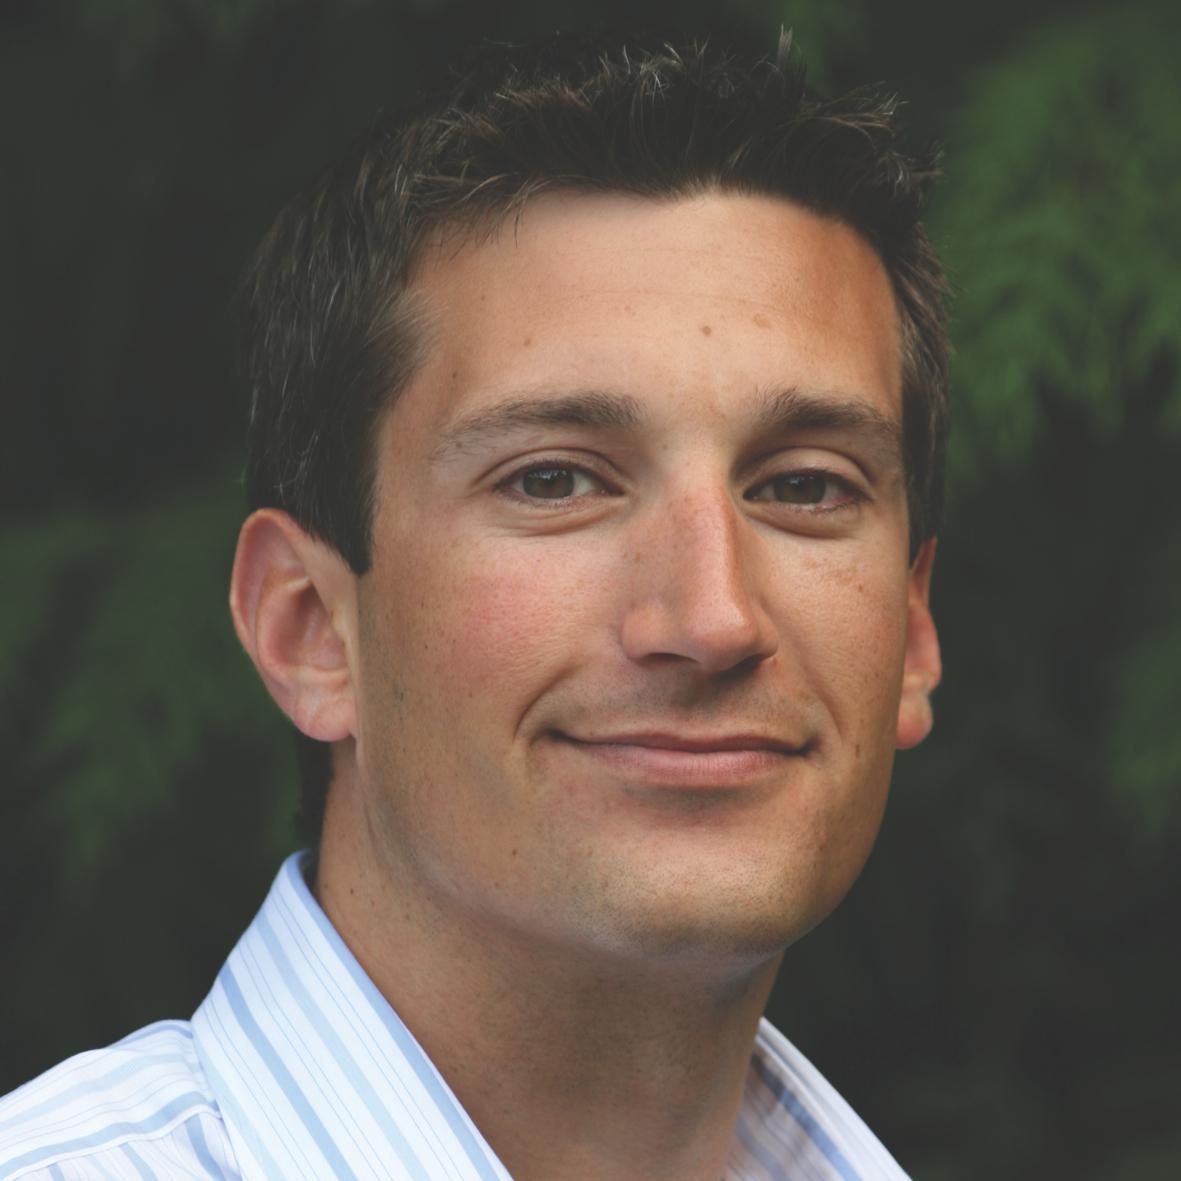 Matt Duffy, partnerships manager at Lorica